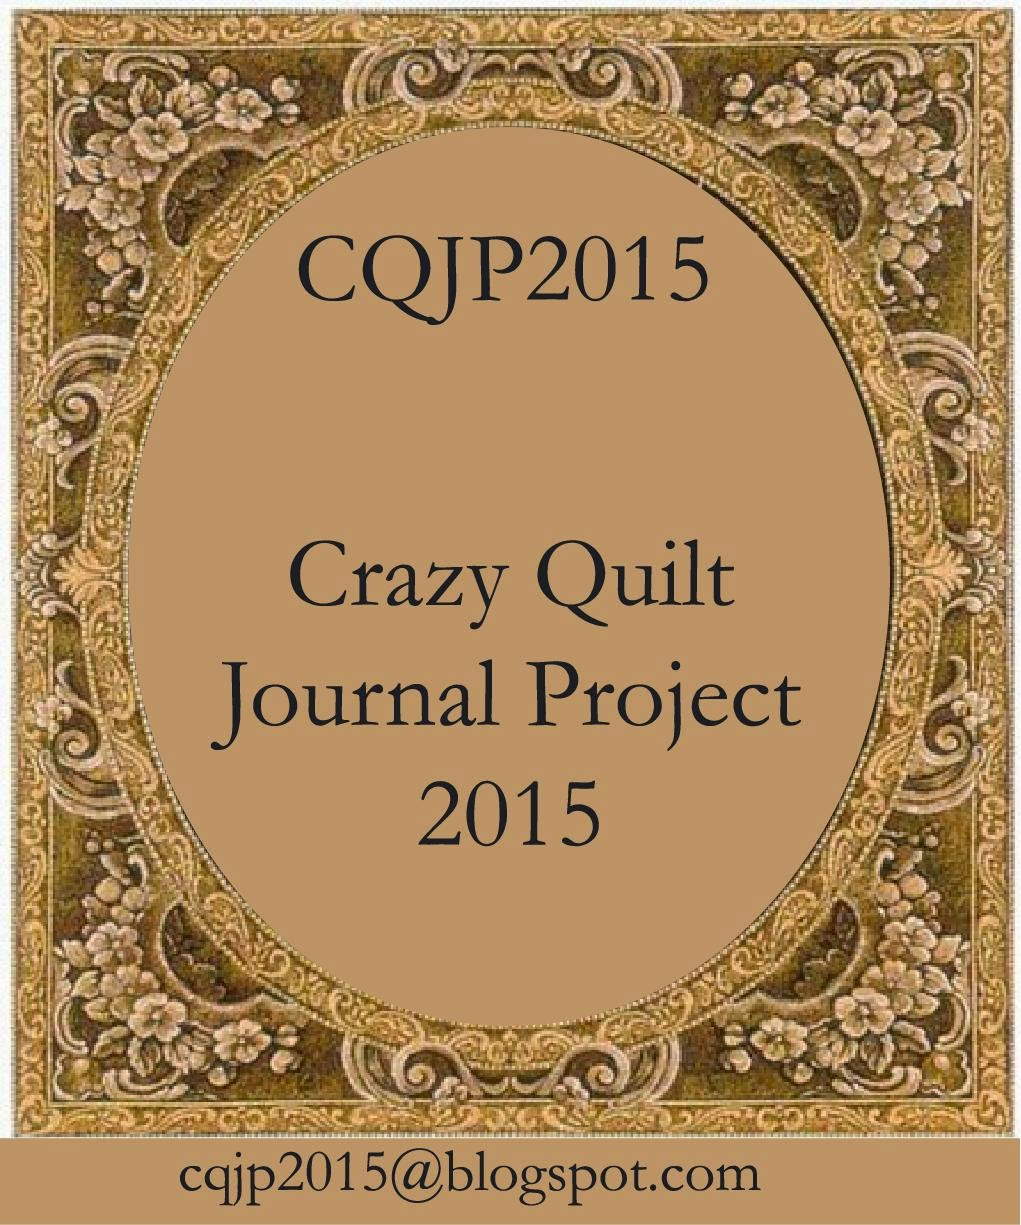 CQJP2015